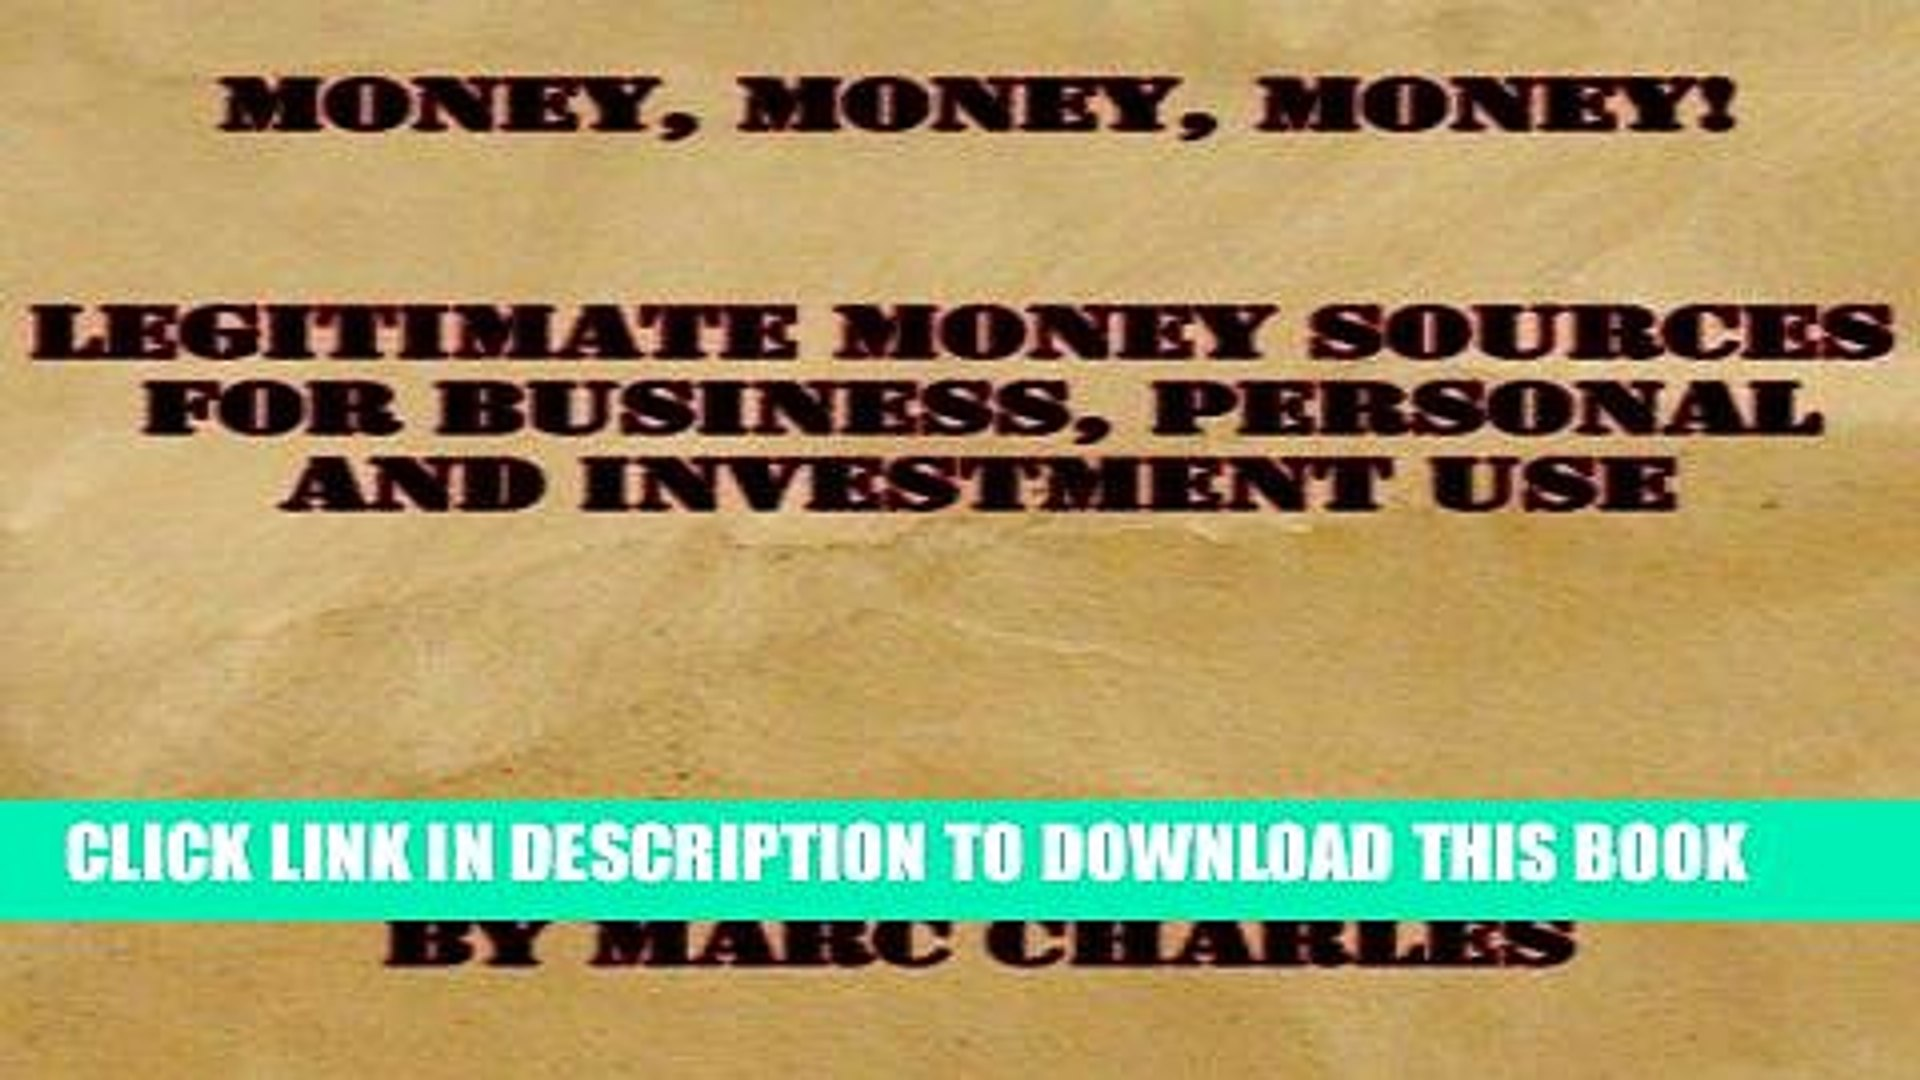 [Read] PDF Money, Money, Money! New Version